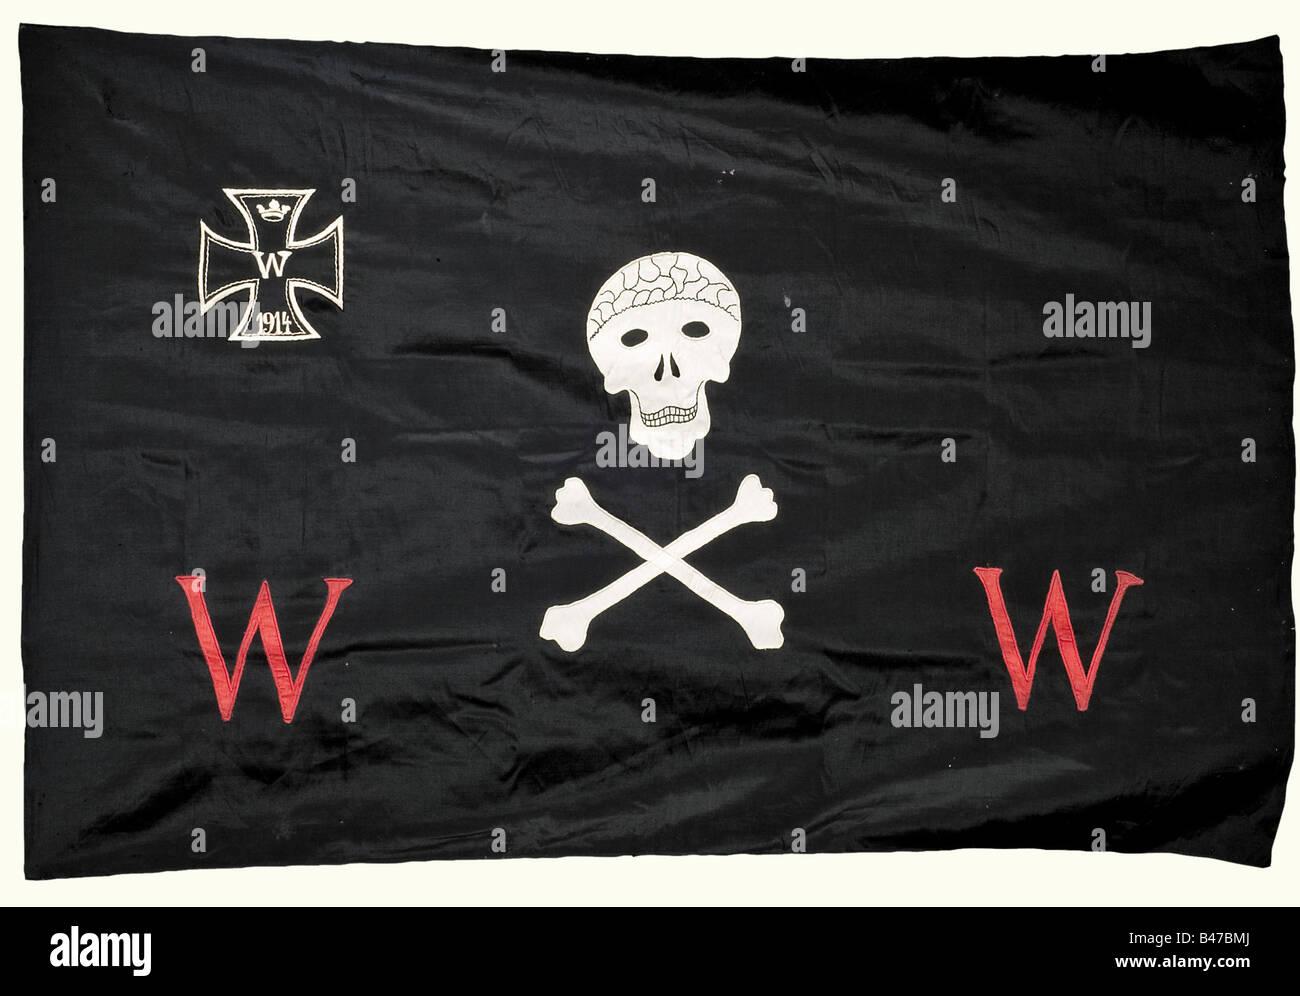 Weimar Republic, Der Wehrwolf (German Men's Association), a banner, a flag nail, and a member's book Banner, - Stock Image